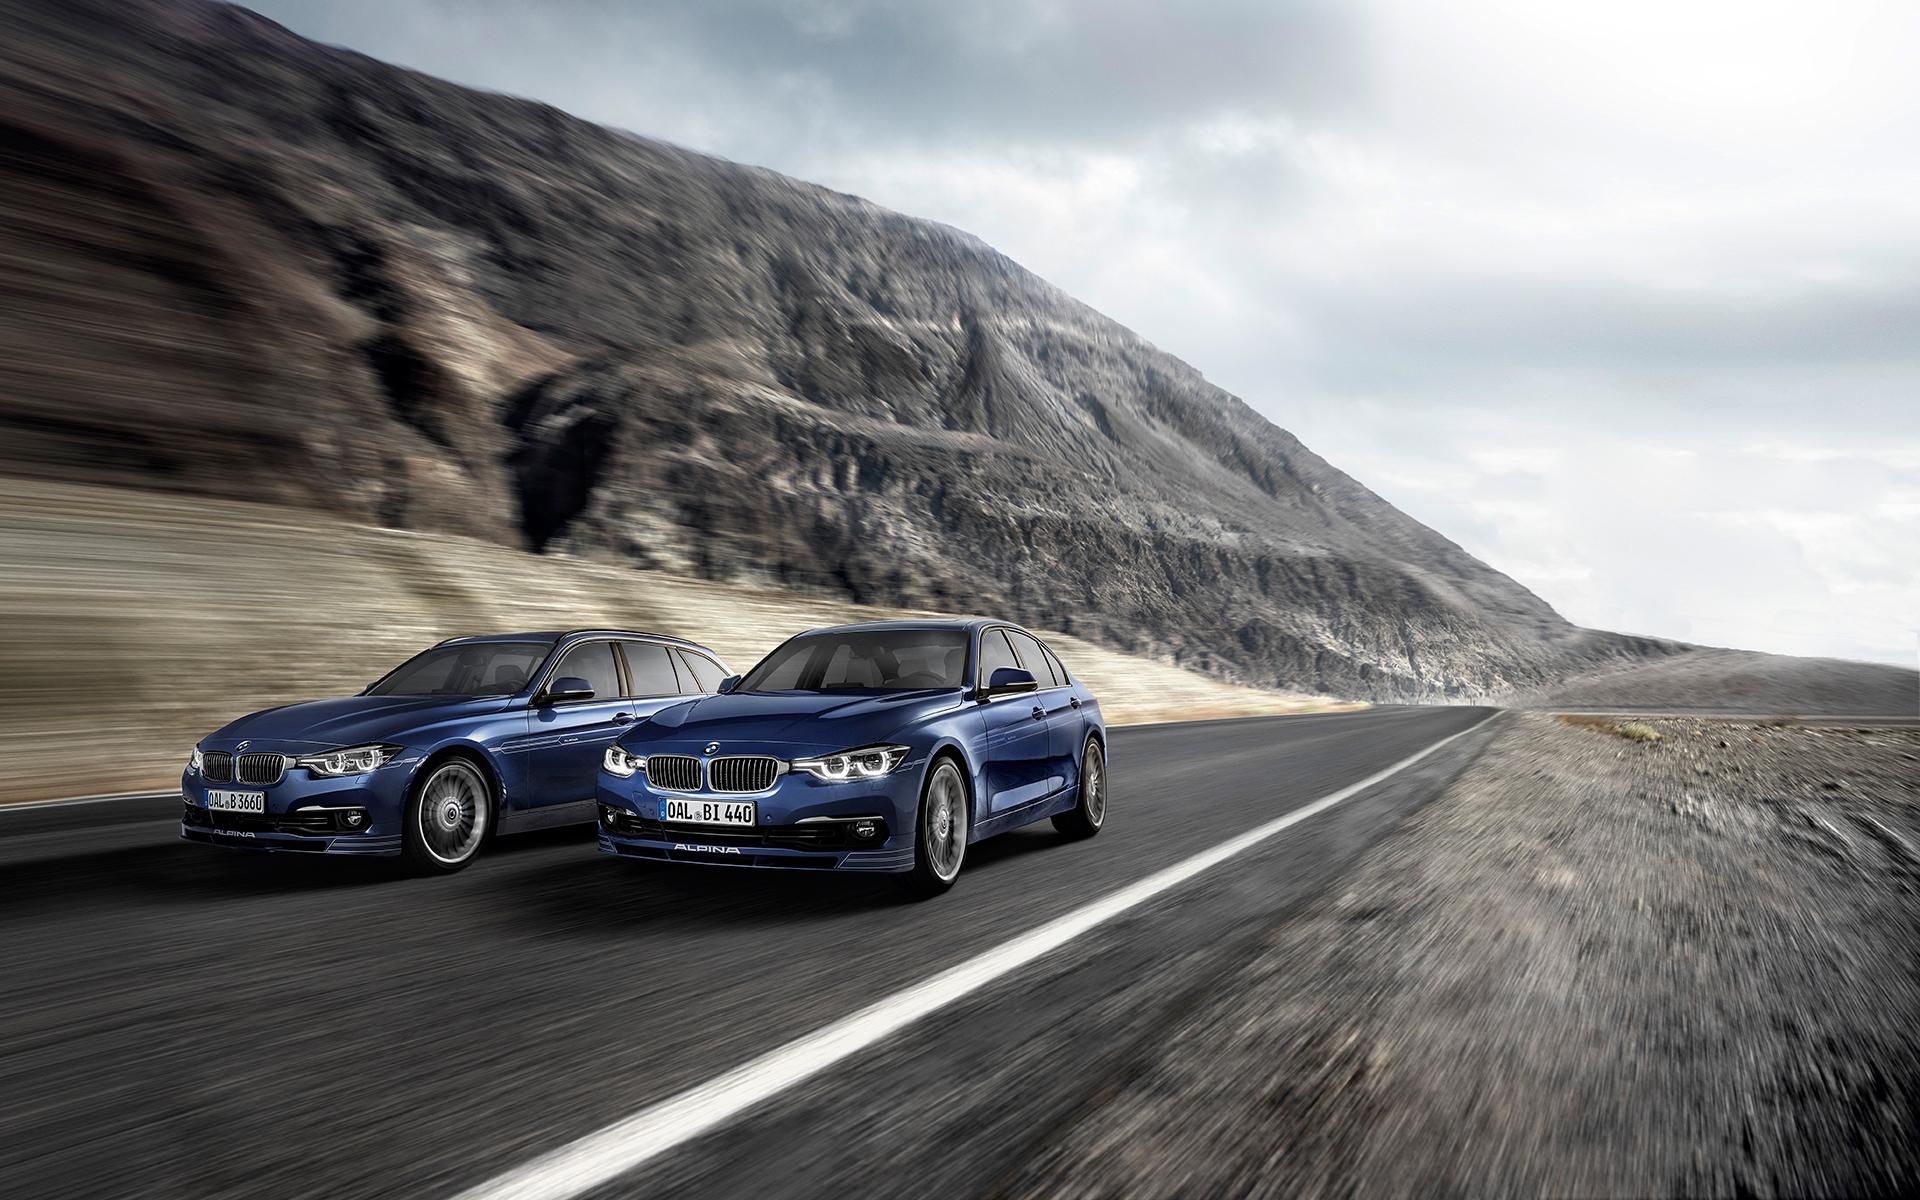 BMW_ALPINA_B3_S_BITURBO_05